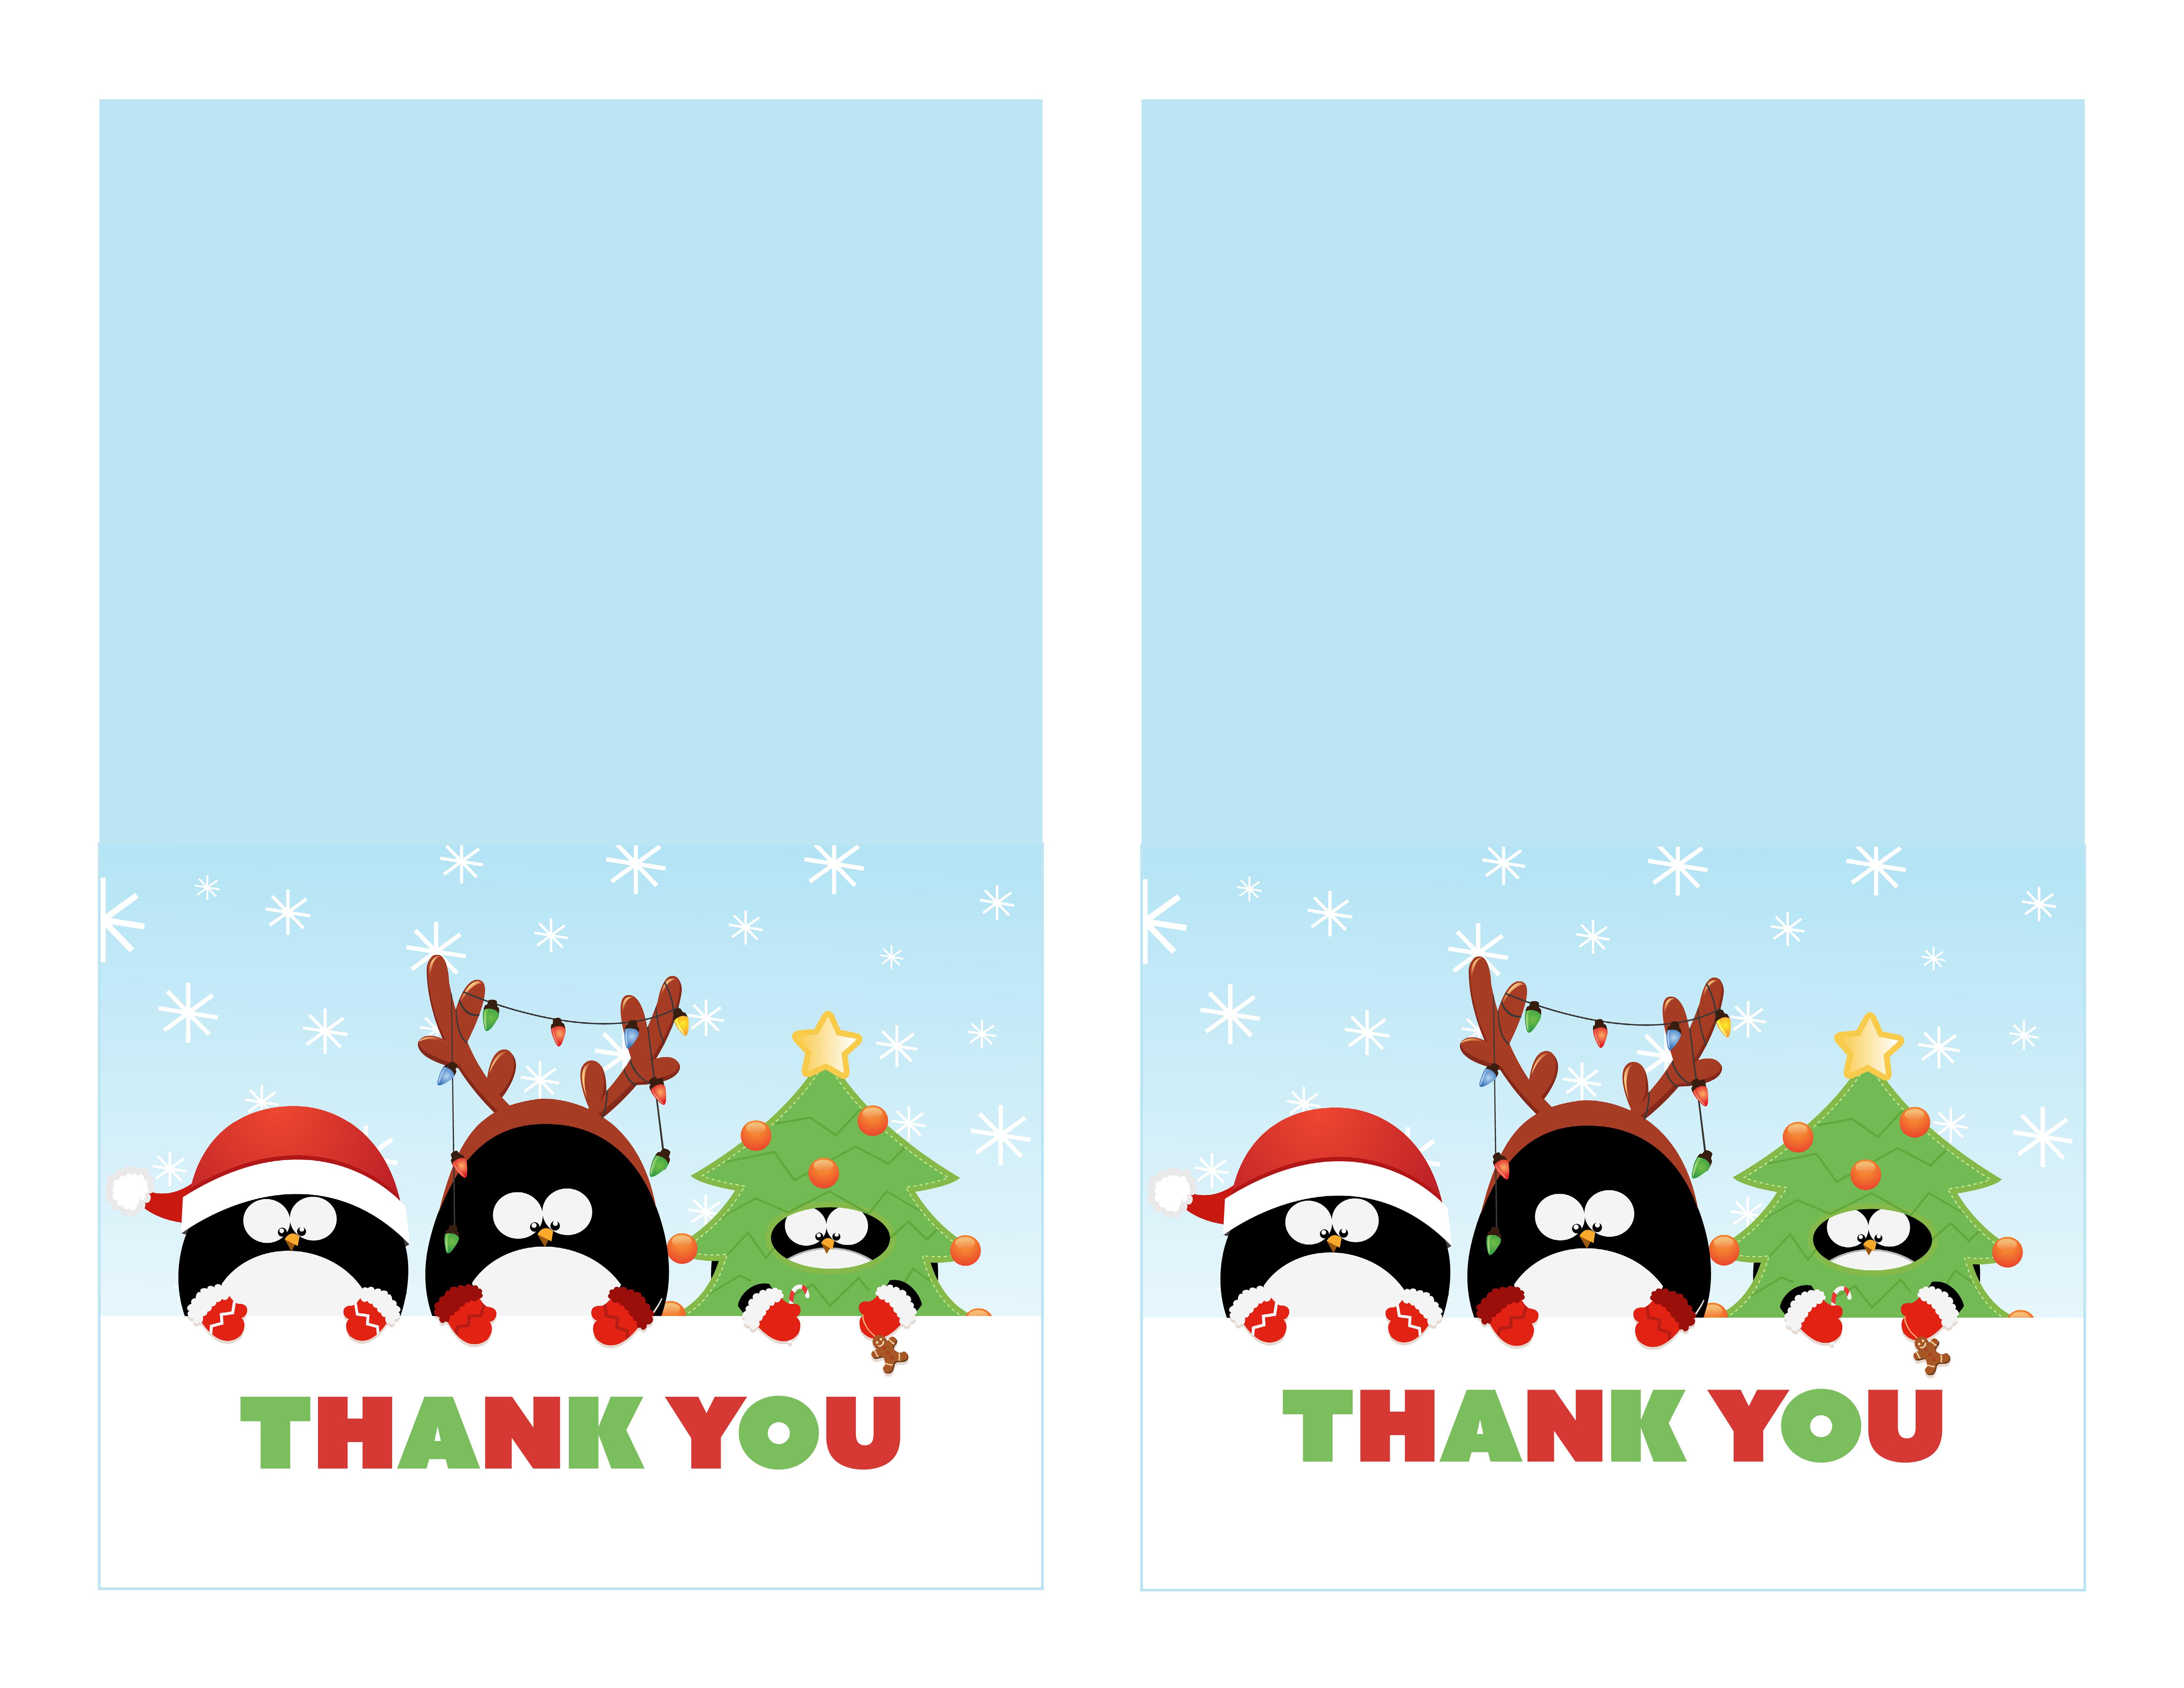 Free Printable Christmas Thank You Cards - Printable Cards - Free Printable Happy Holidays Greeting Cards